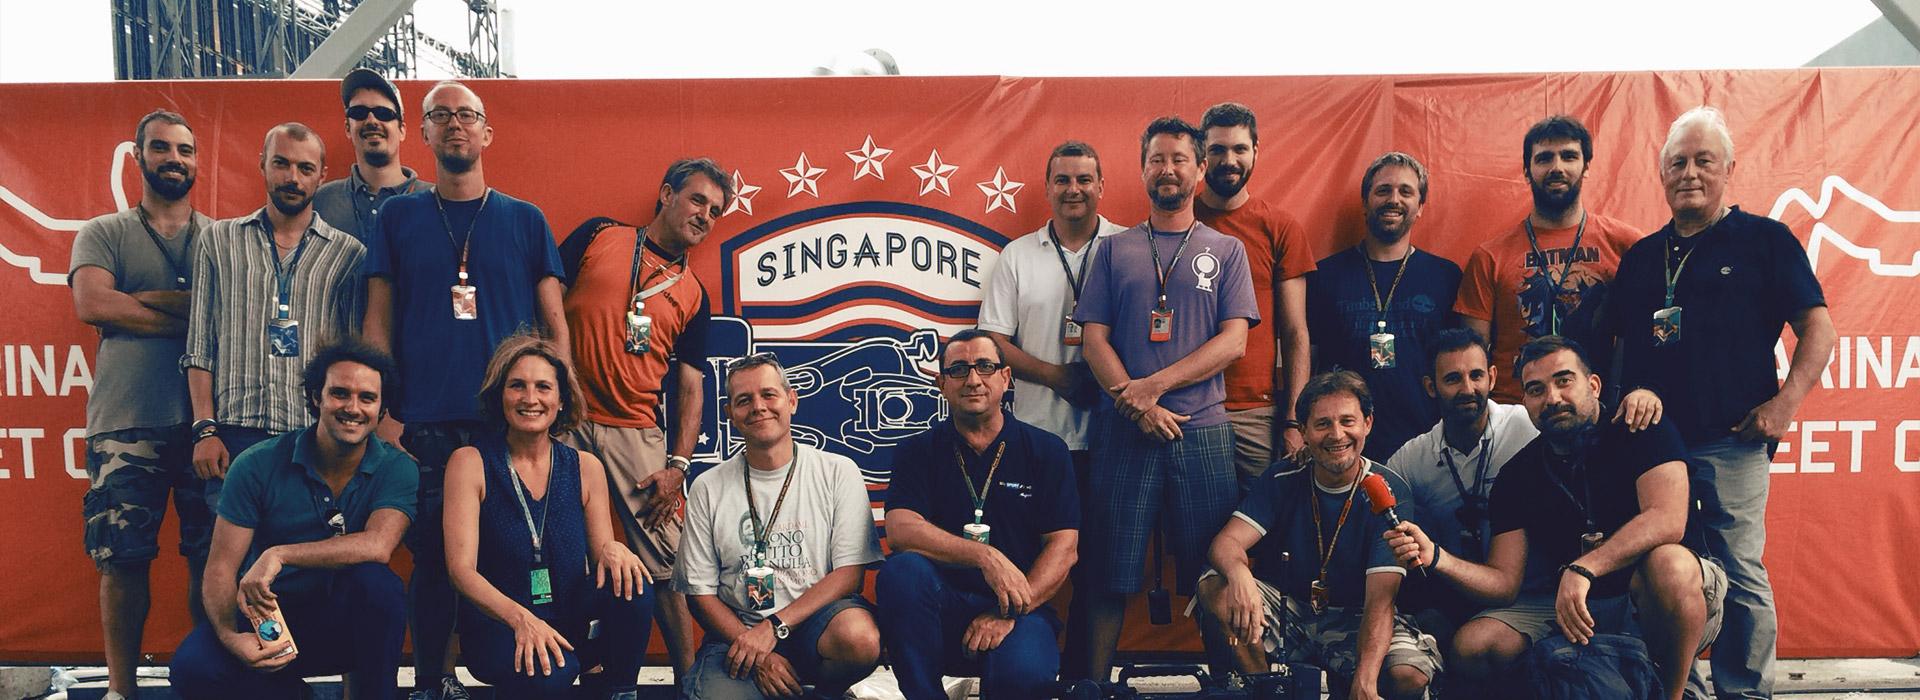 Il team di Videe a Singapore